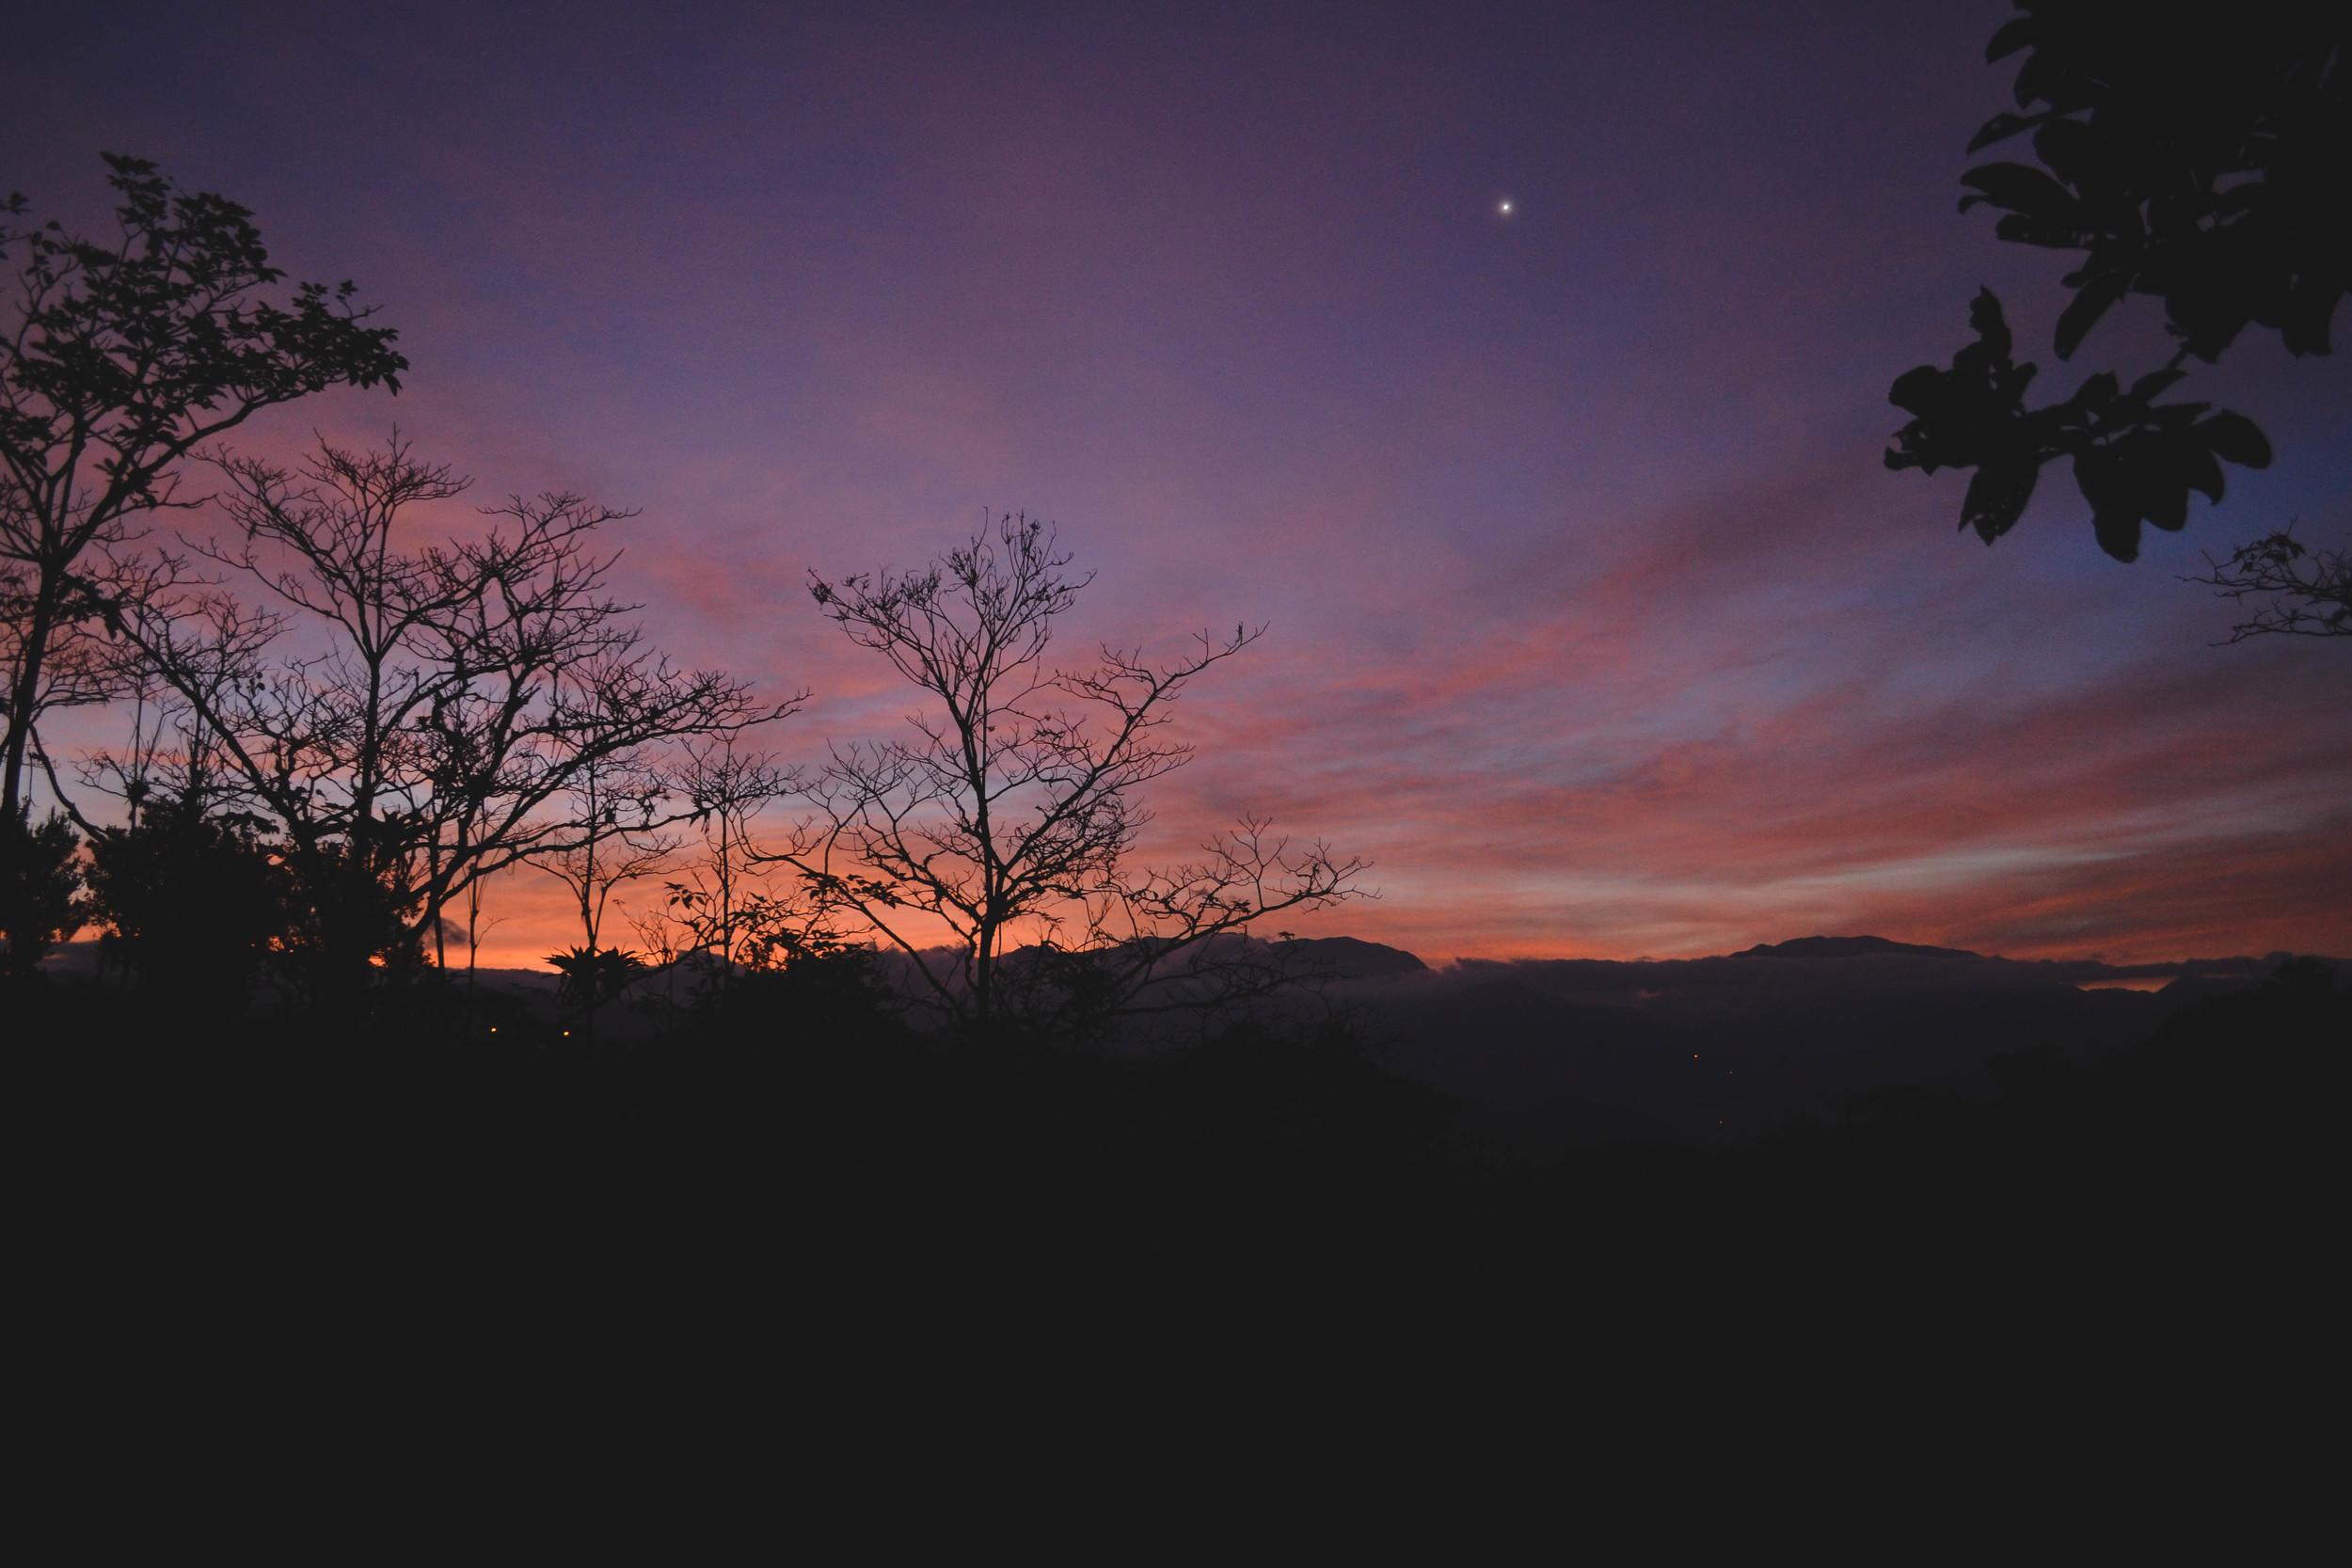 One of my last sunrises at La Iguana